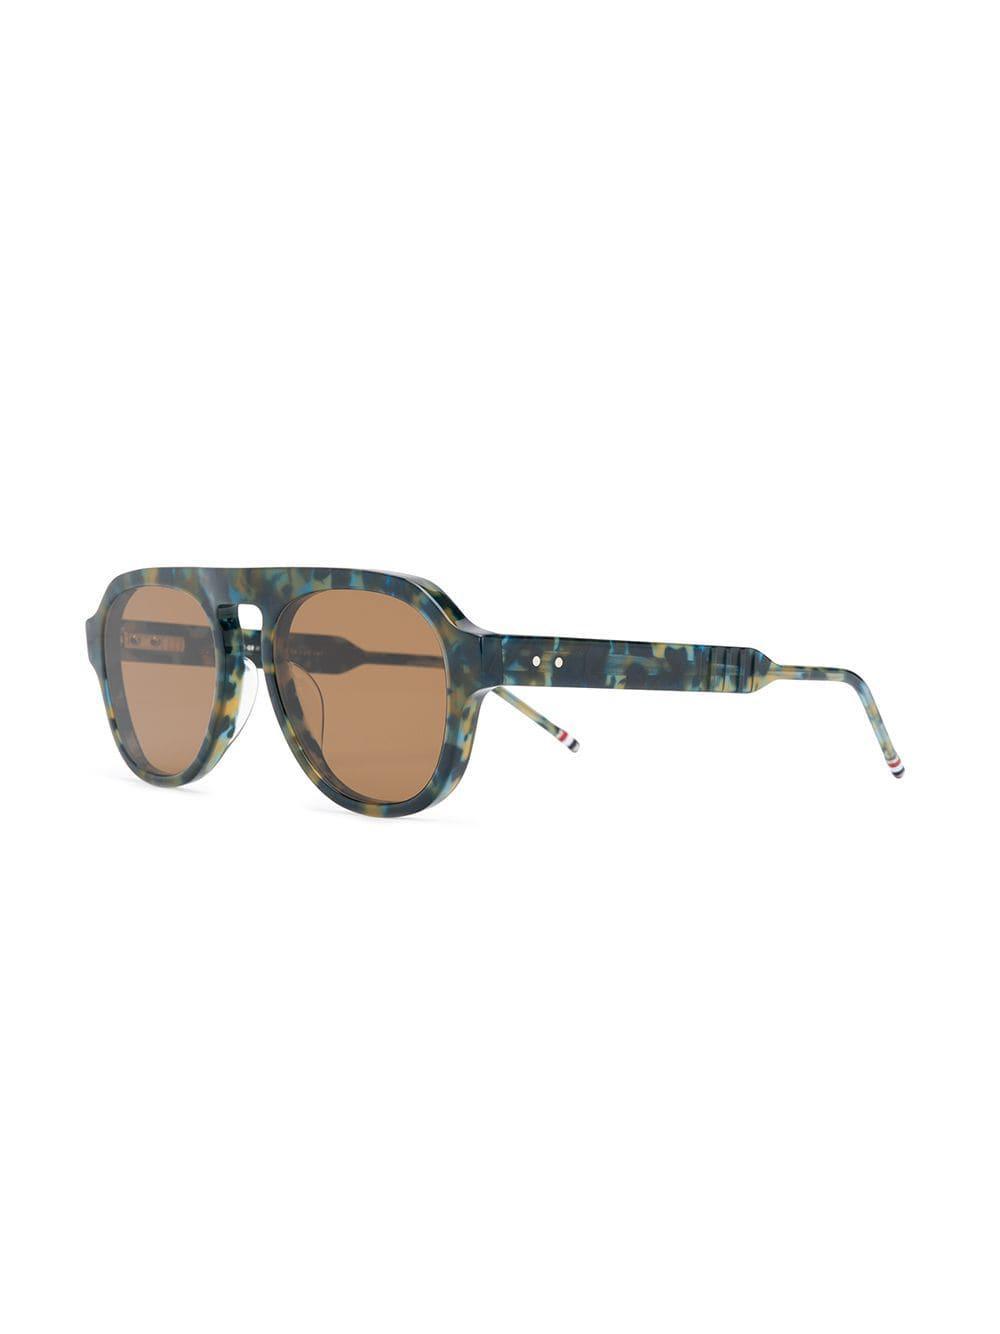 afa0e3d325d Thom Browne - Blue Aviator Sunglasses - Lyst. View fullscreen